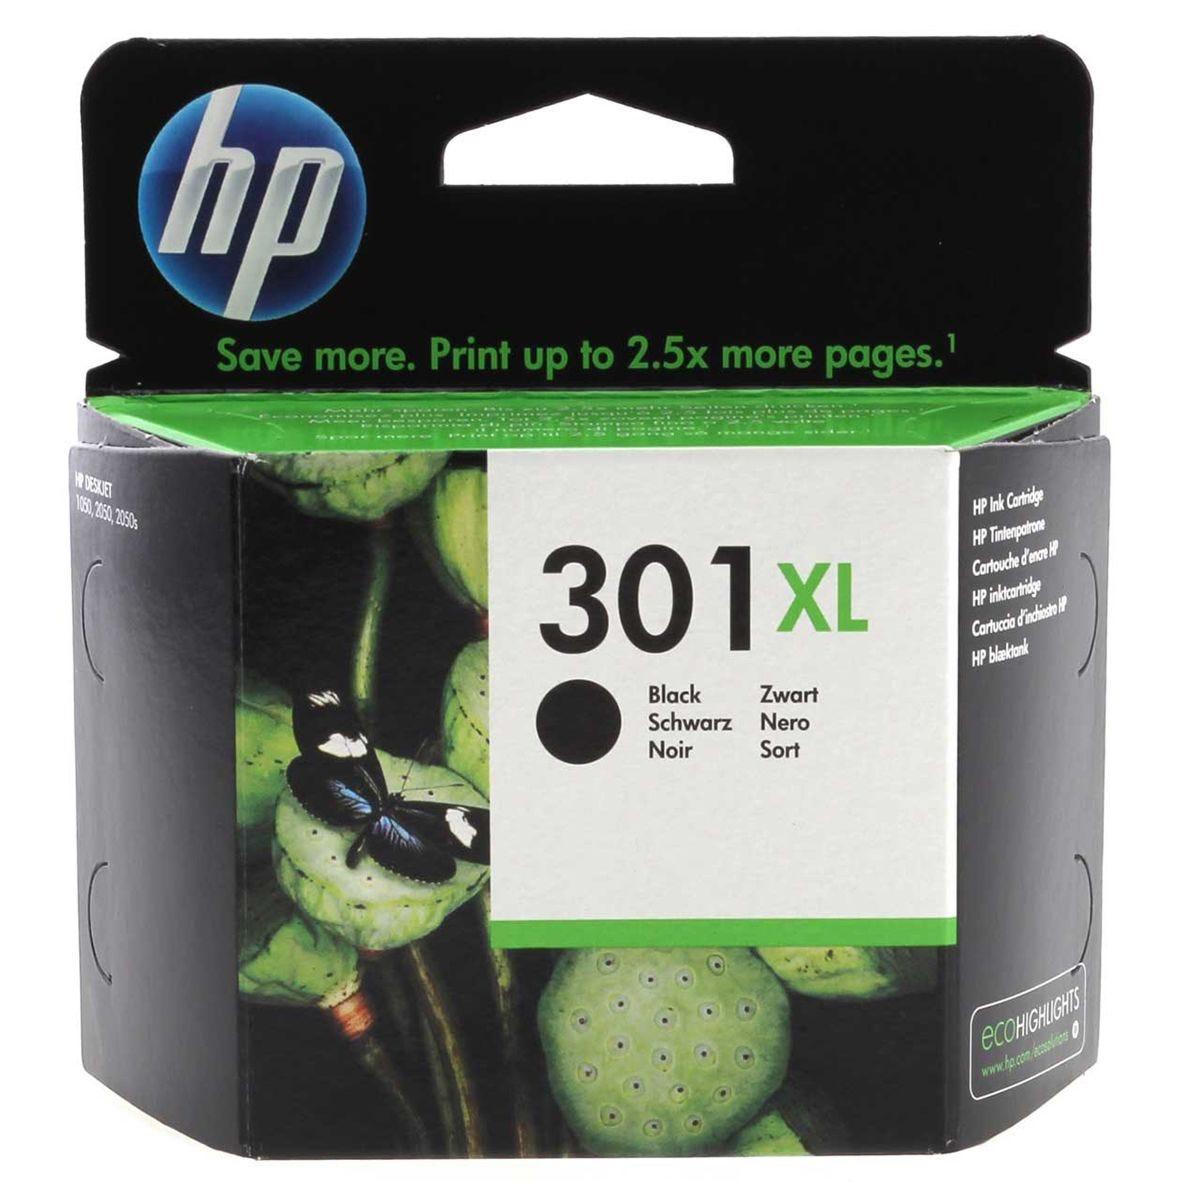 HP 301XL Inkjet Cartridge - Black